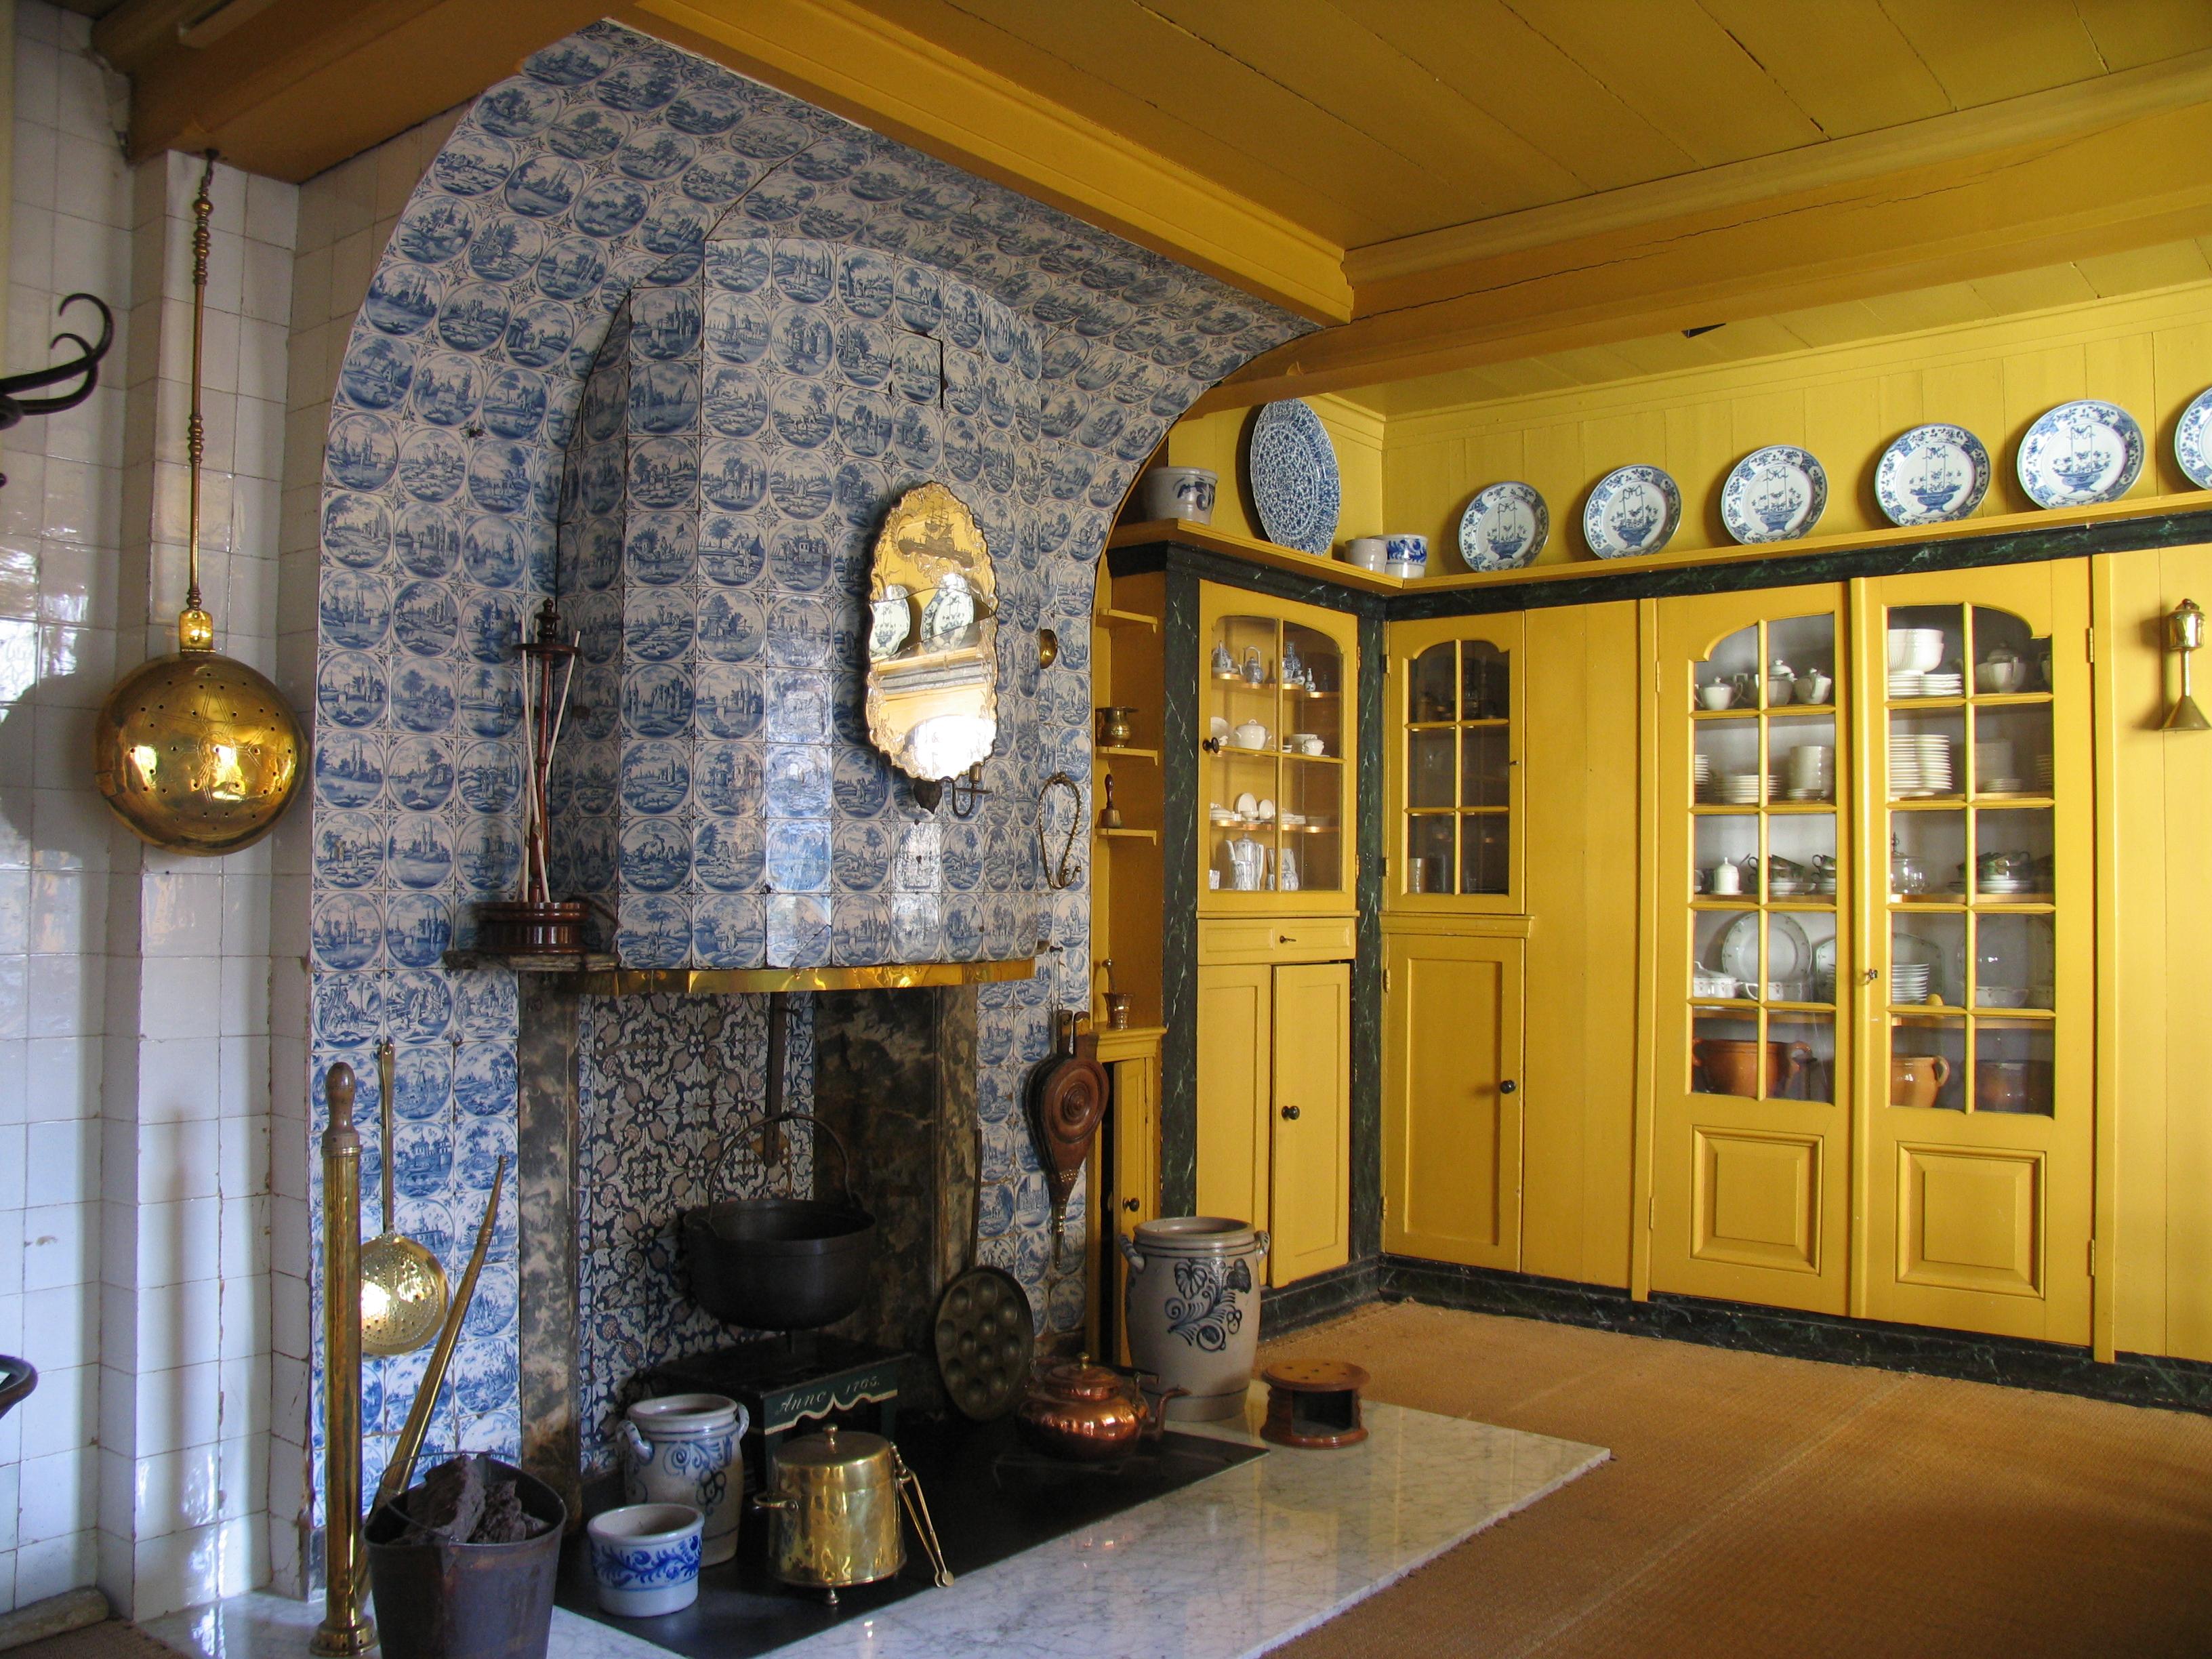 Honig Breethuis geregistreerd museum